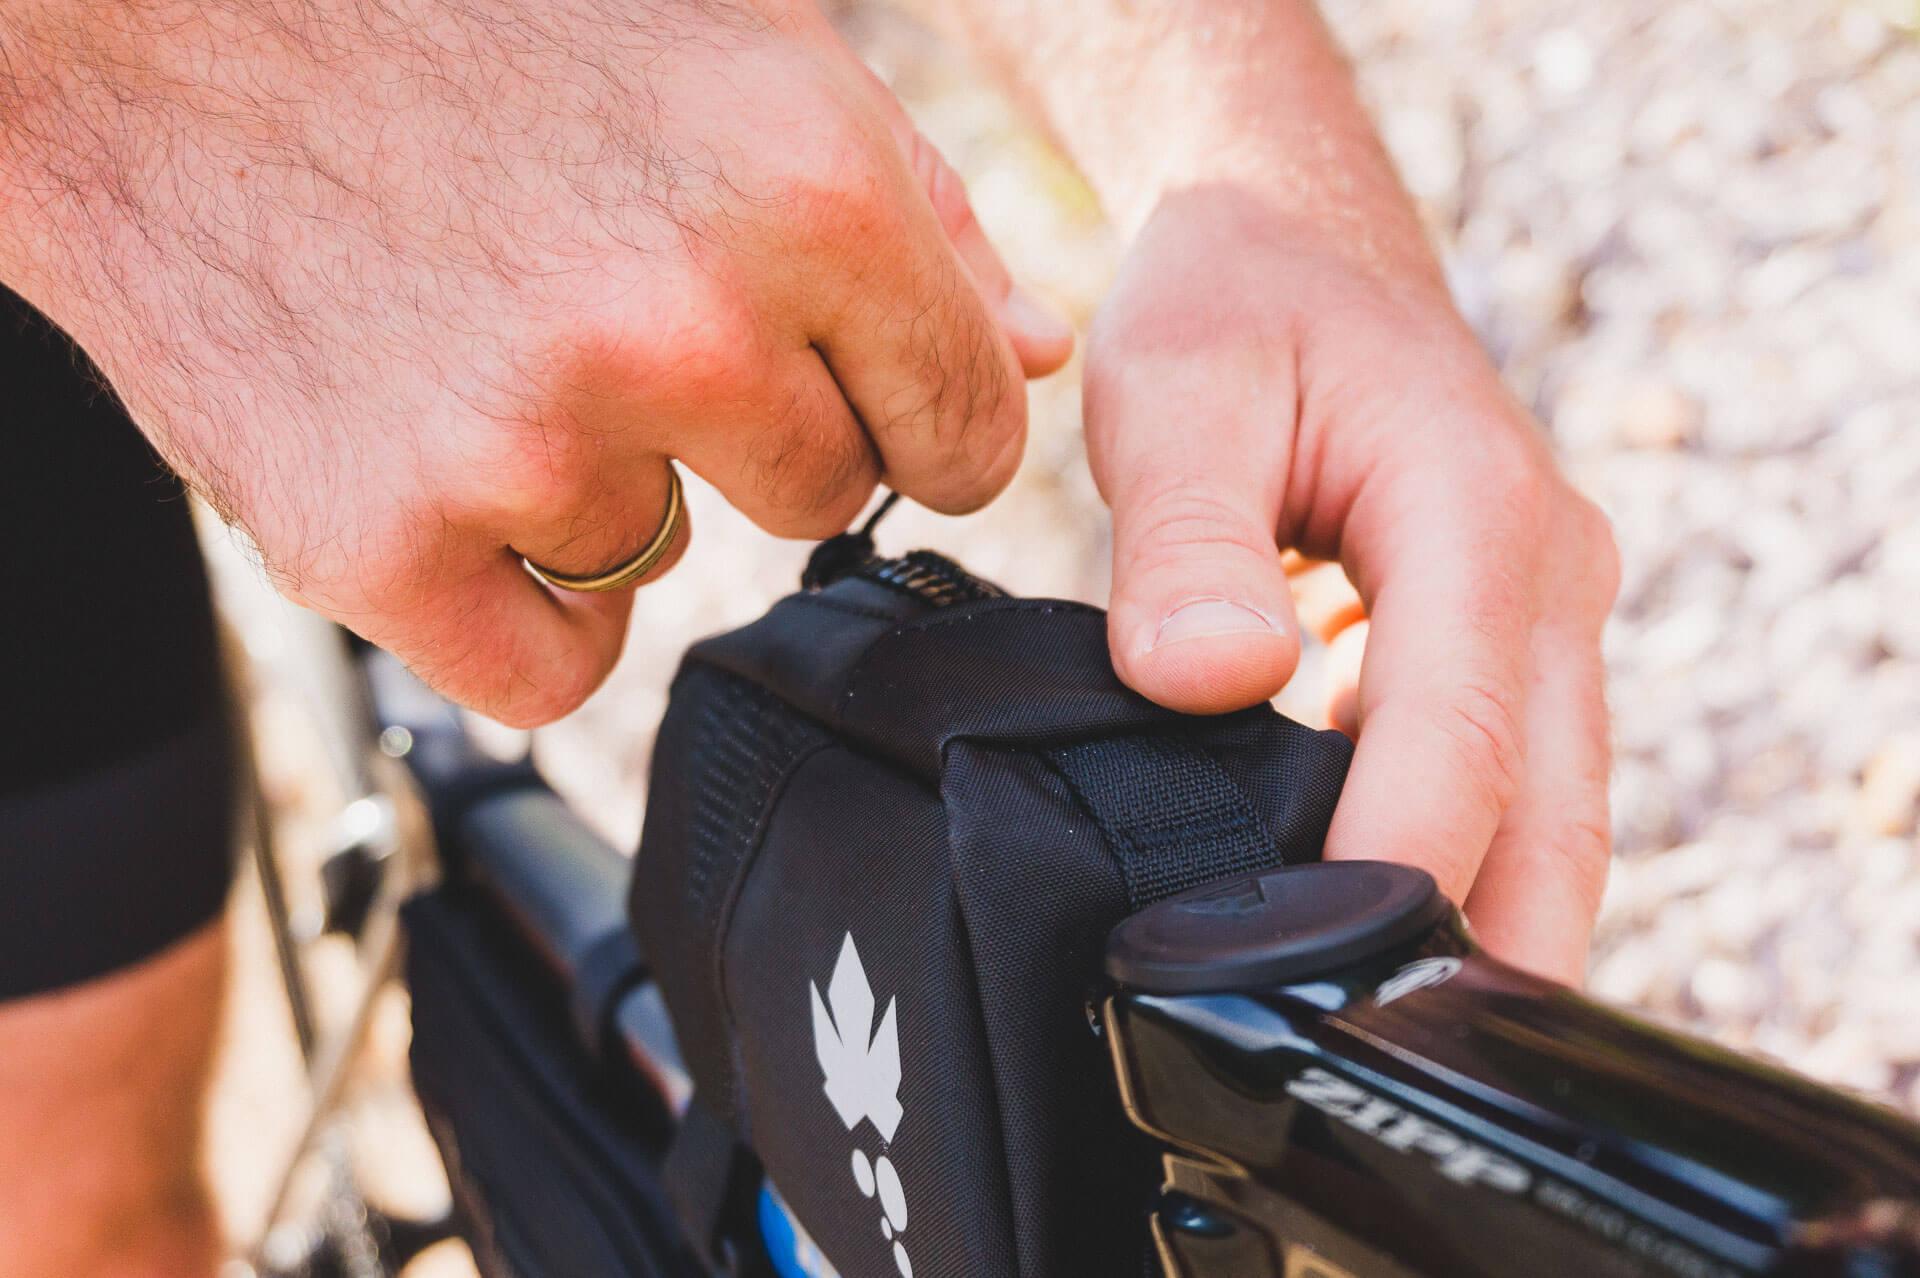 miss-grape-borsa-bikepacking-strada (5 di 5)